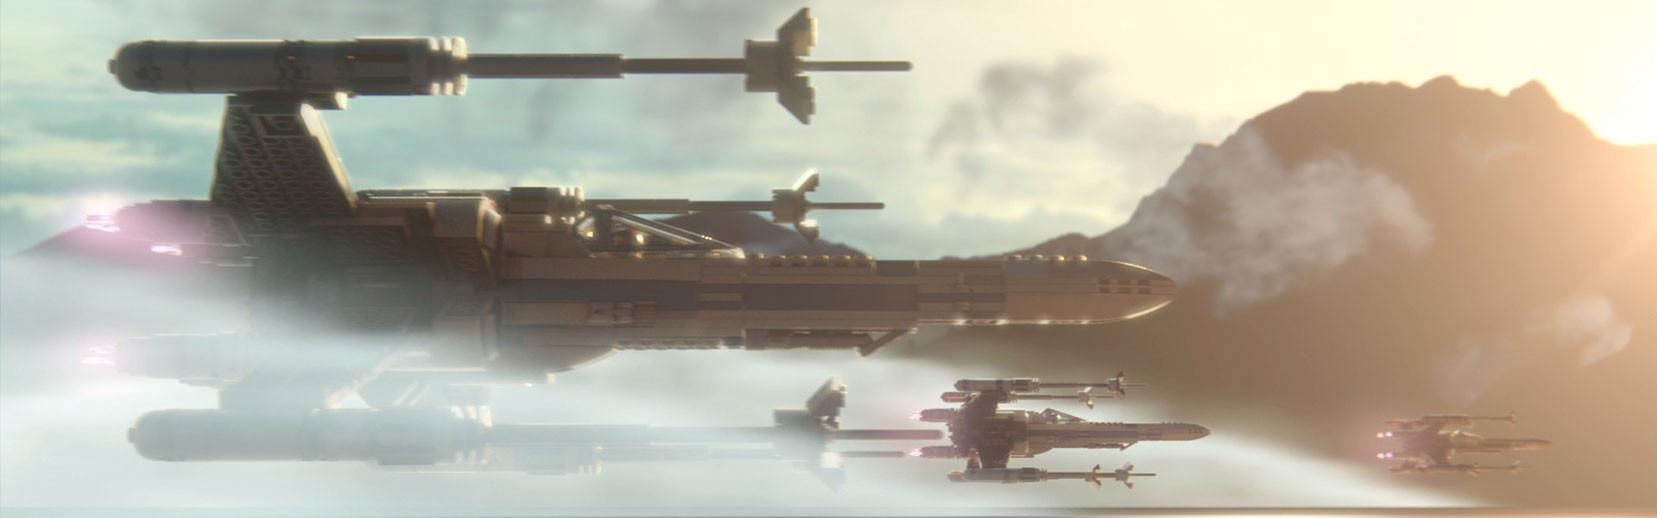 LEGO Star Wars: The Force Awakens - Season Pass (DLC) Steam Key GLOBAL